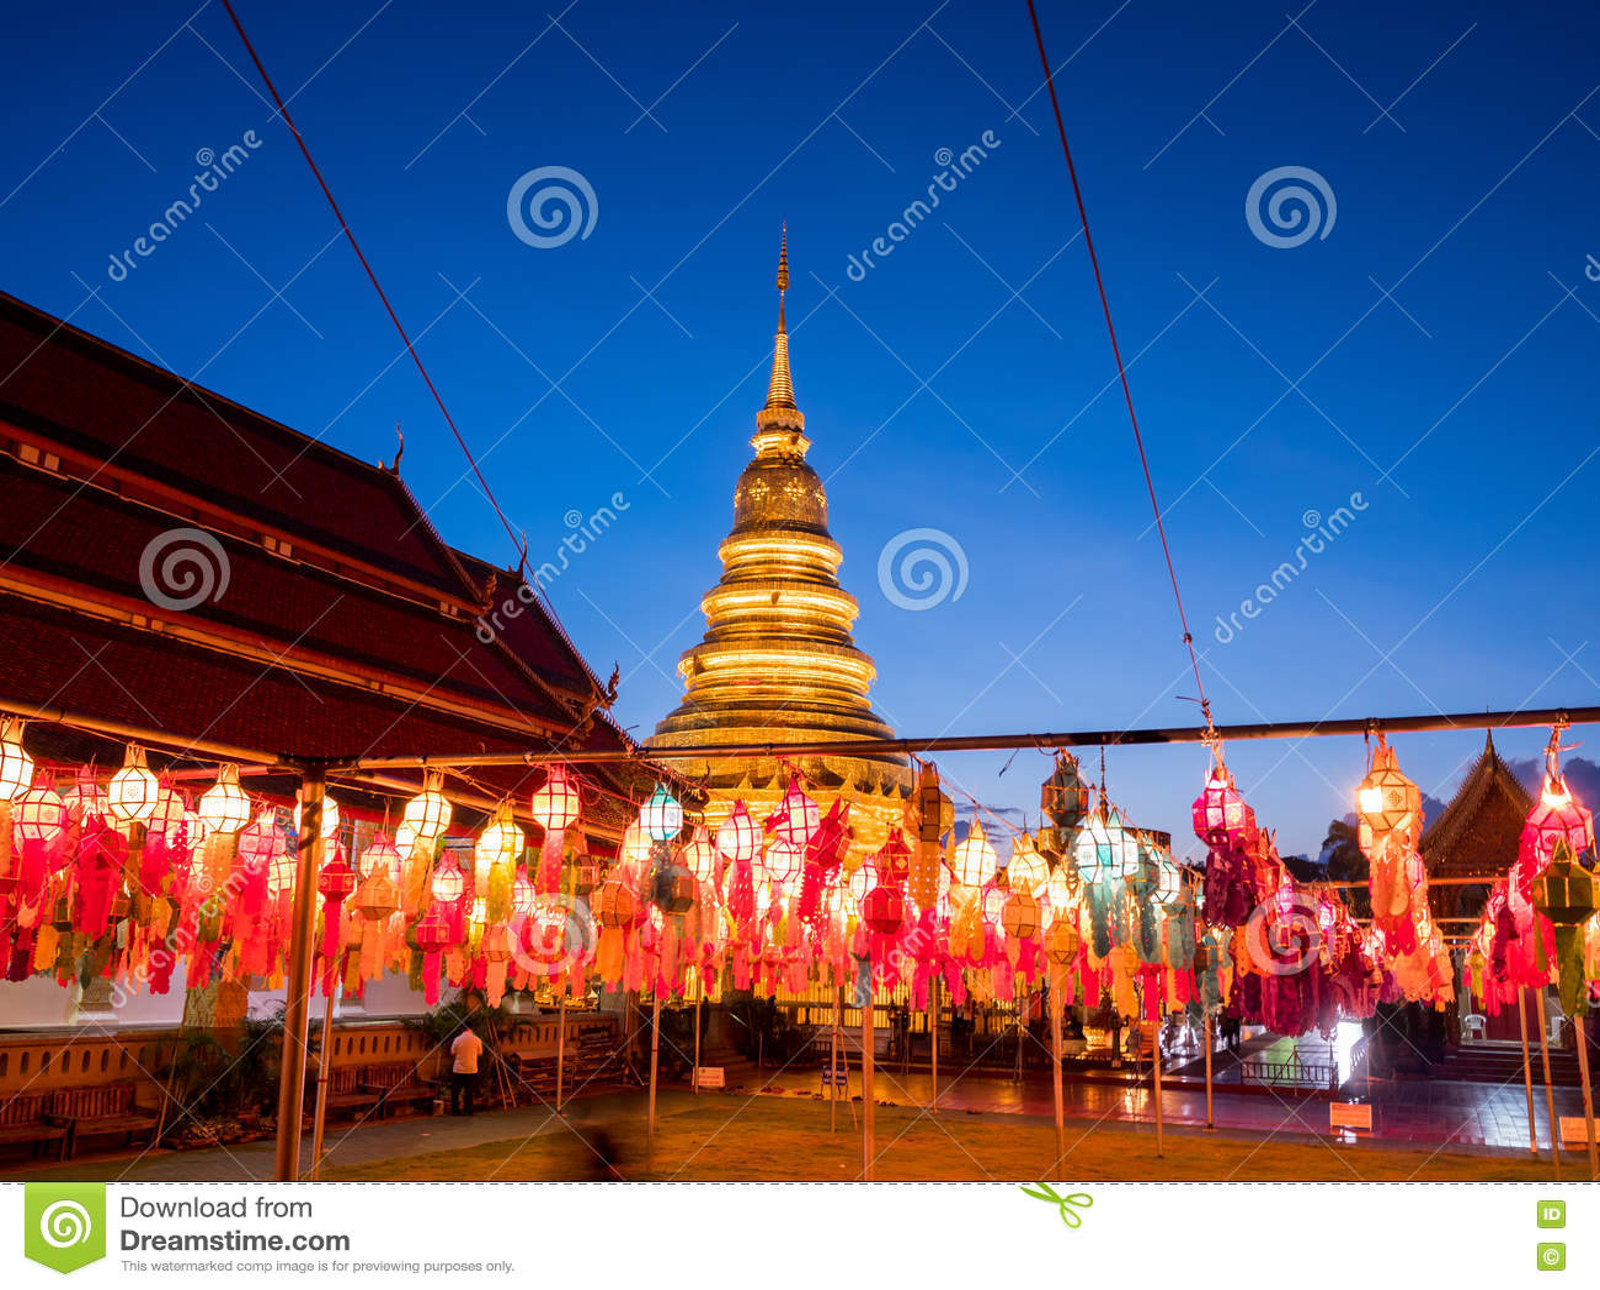 Bunte Lampe und Laterne in Loi Krathong Wat Phra That Haripunc